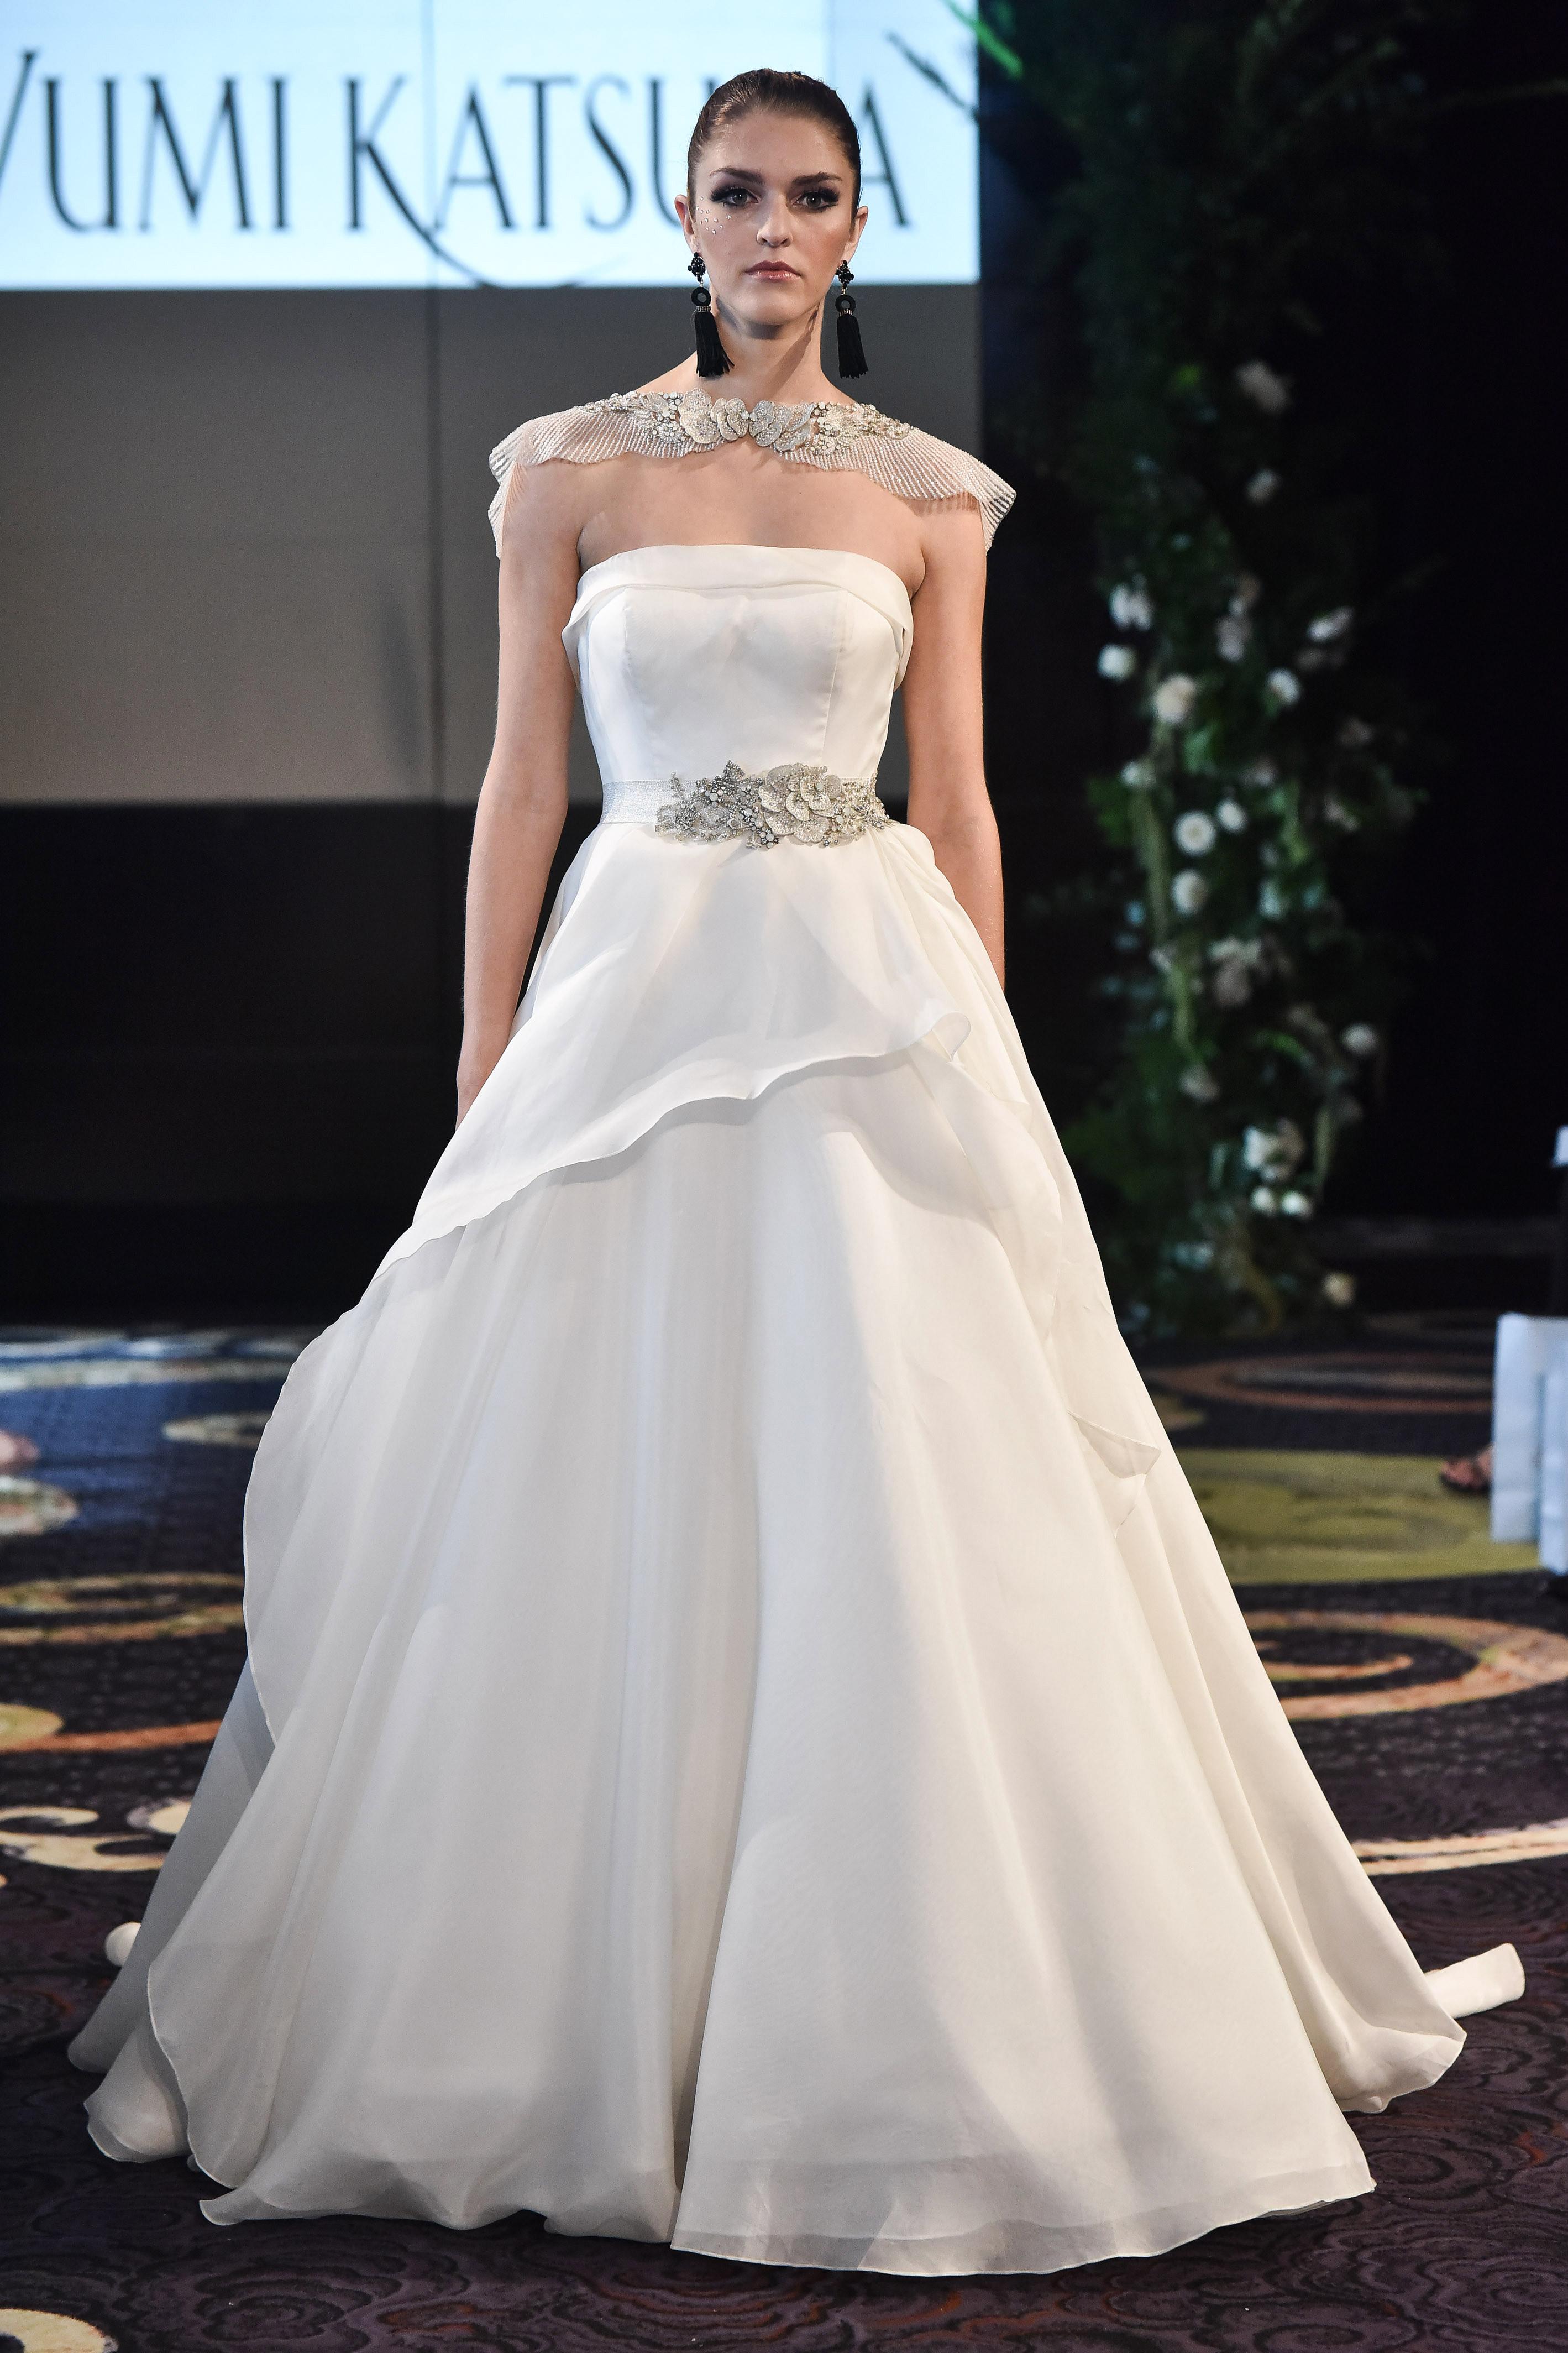 yumi katsura fall 2018 a-line cape wedding dress